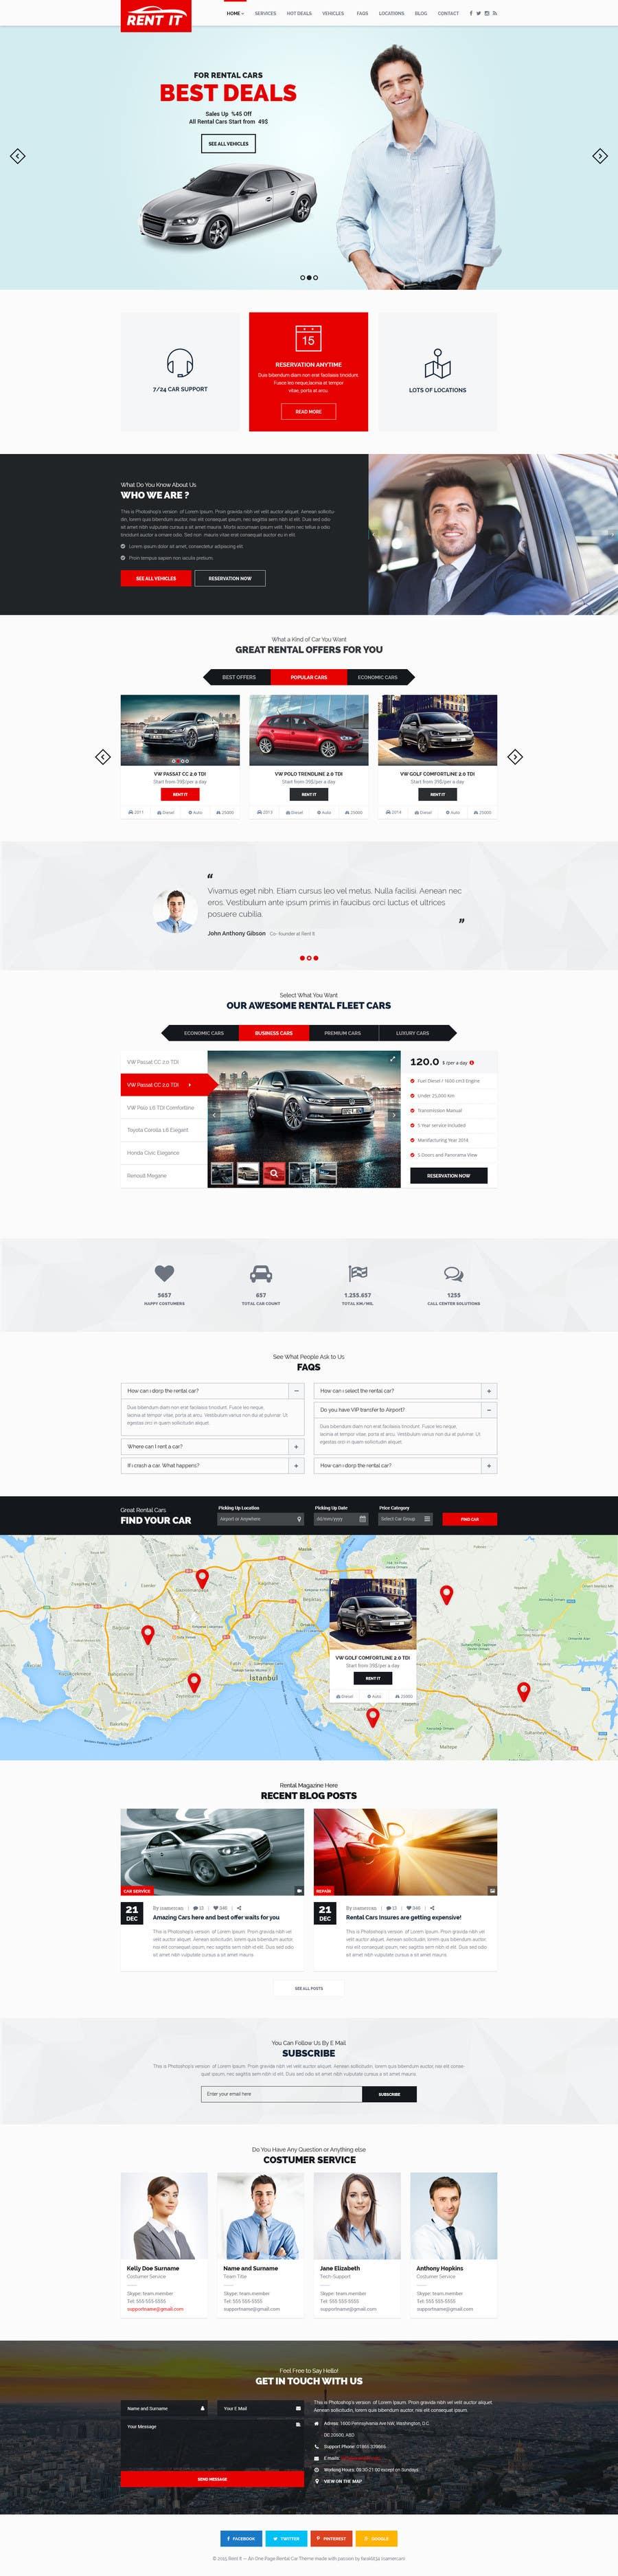 Proposition n°2 du concours Design a Website and Mobile App Mockup